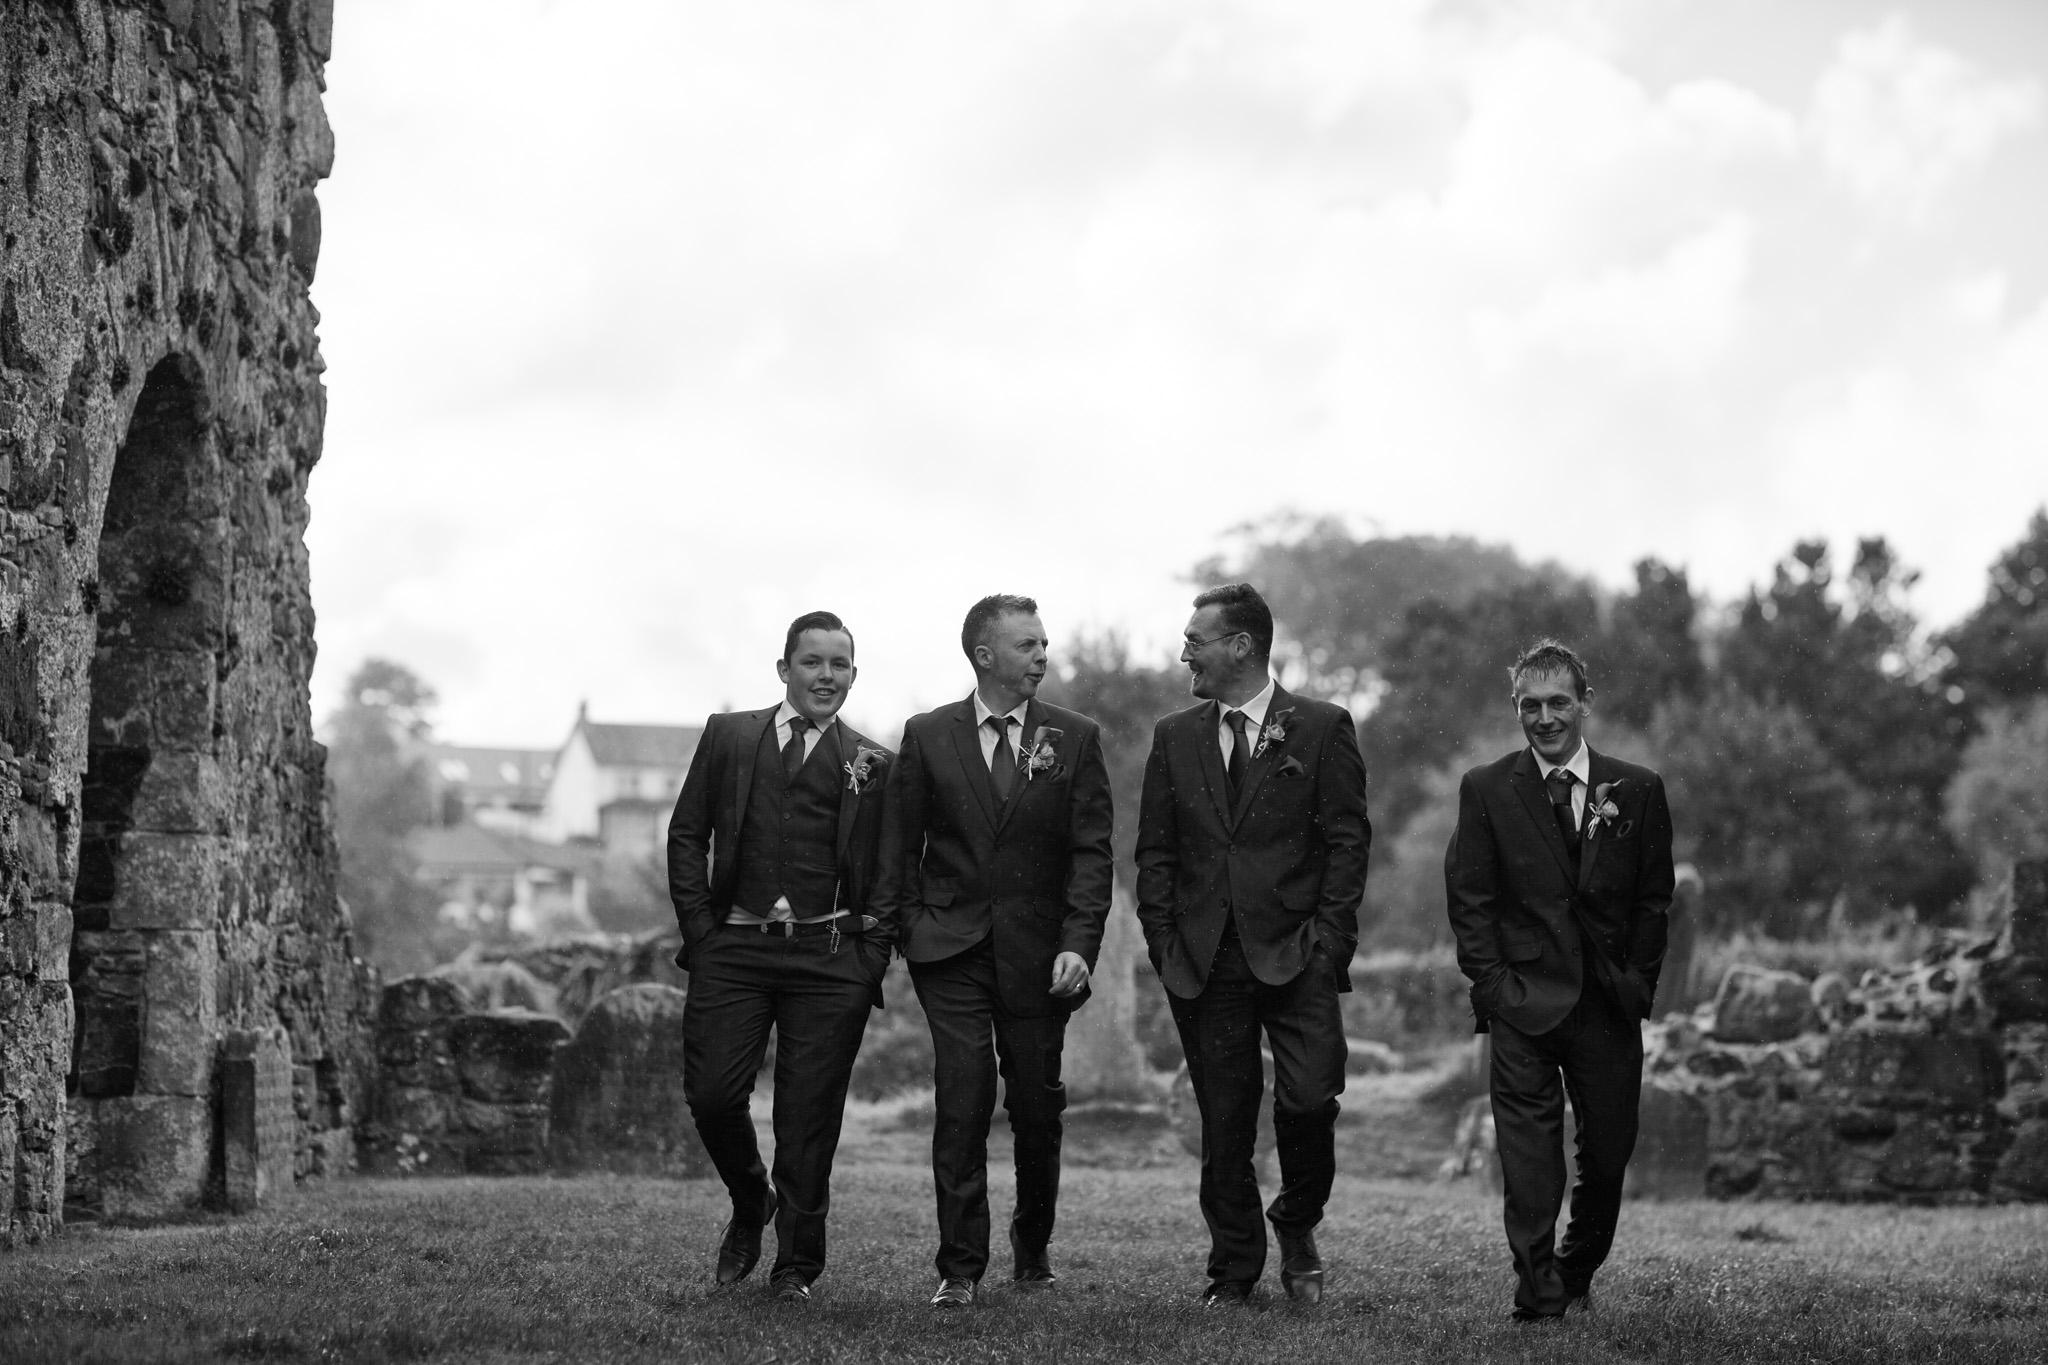 Mark_Barnes_Northern_Ireland_Wedding_Photography_Marine_hotel_ballycastle_Wedding_Photography_Janet&Darren-22.jpg